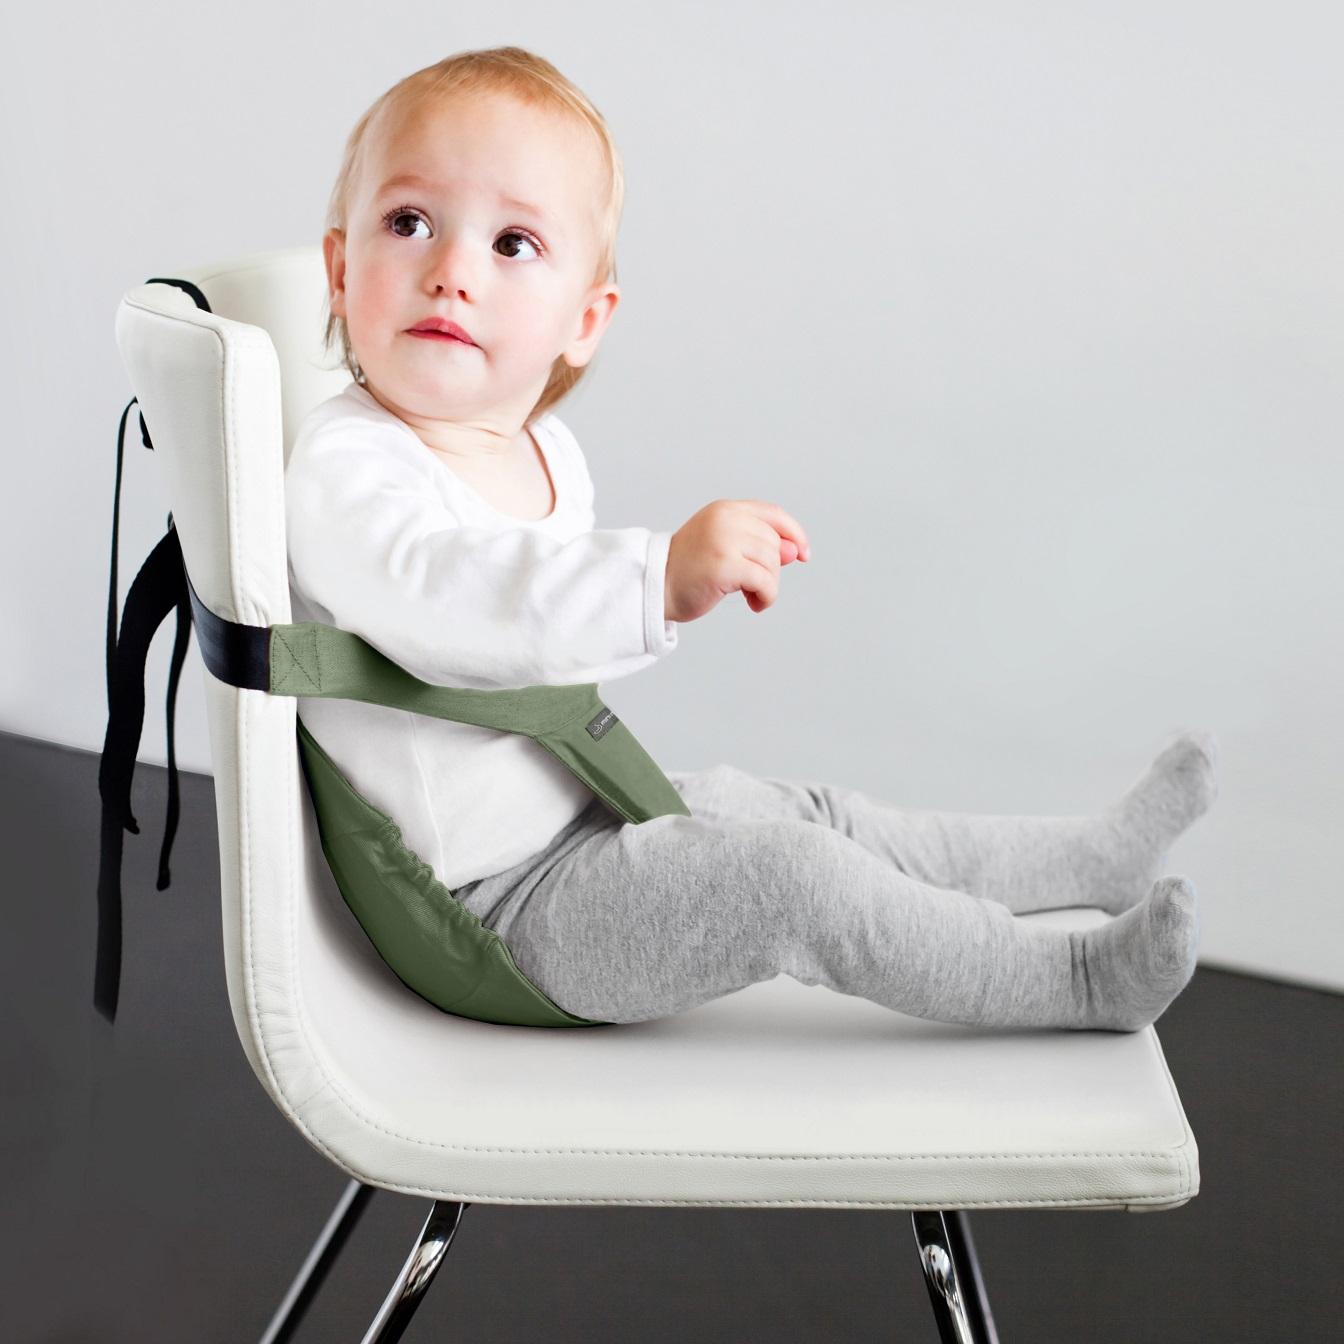 Resebarnstol Minimonkey Minichair Army Green